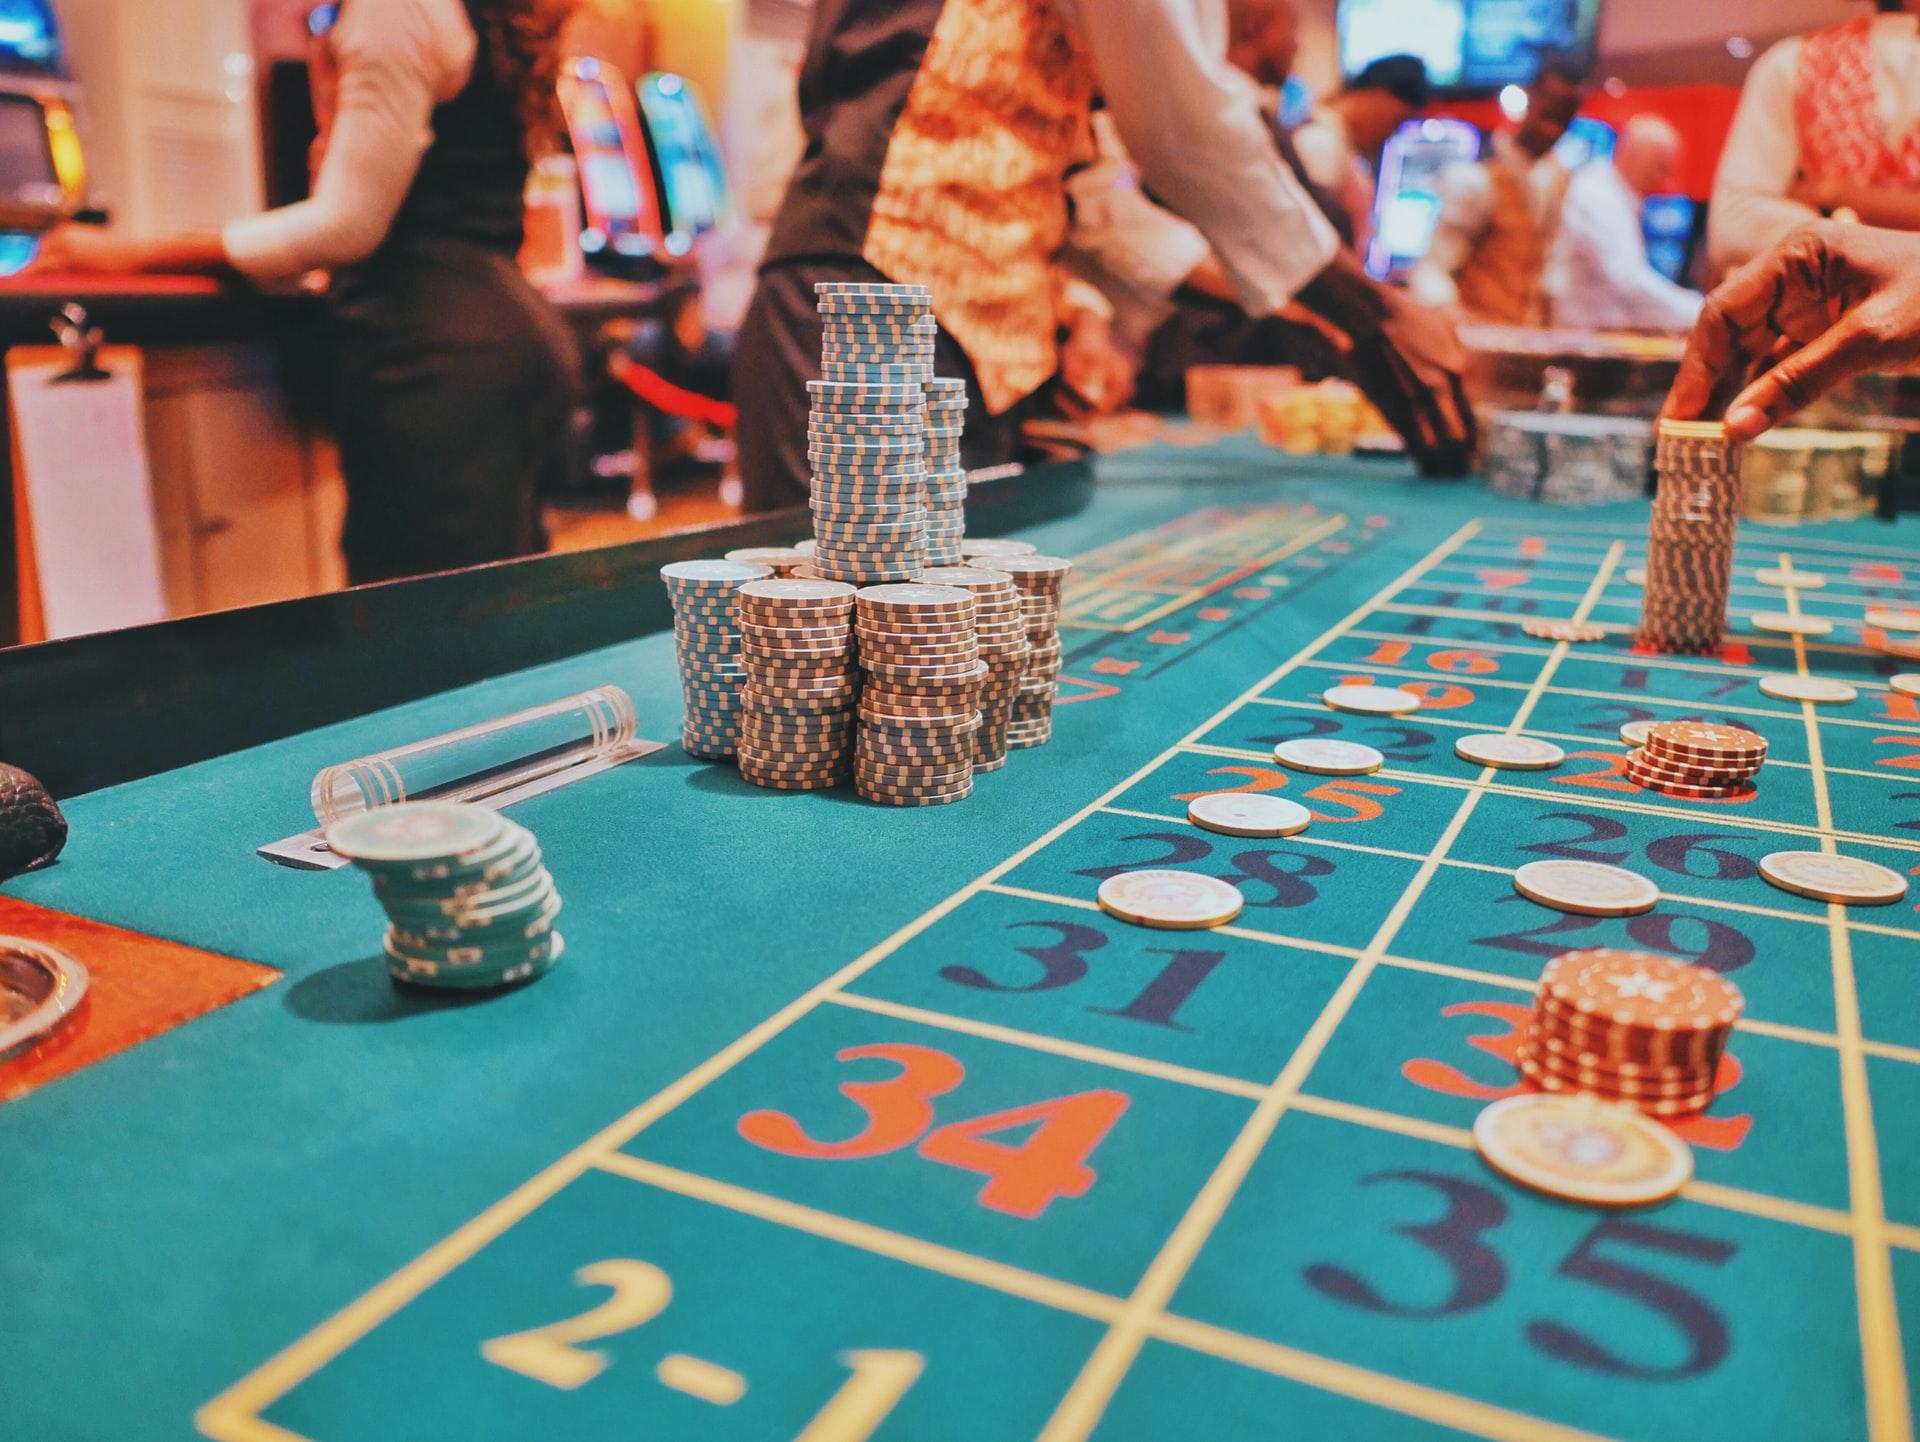 Are Online Blackjack Games Rigged